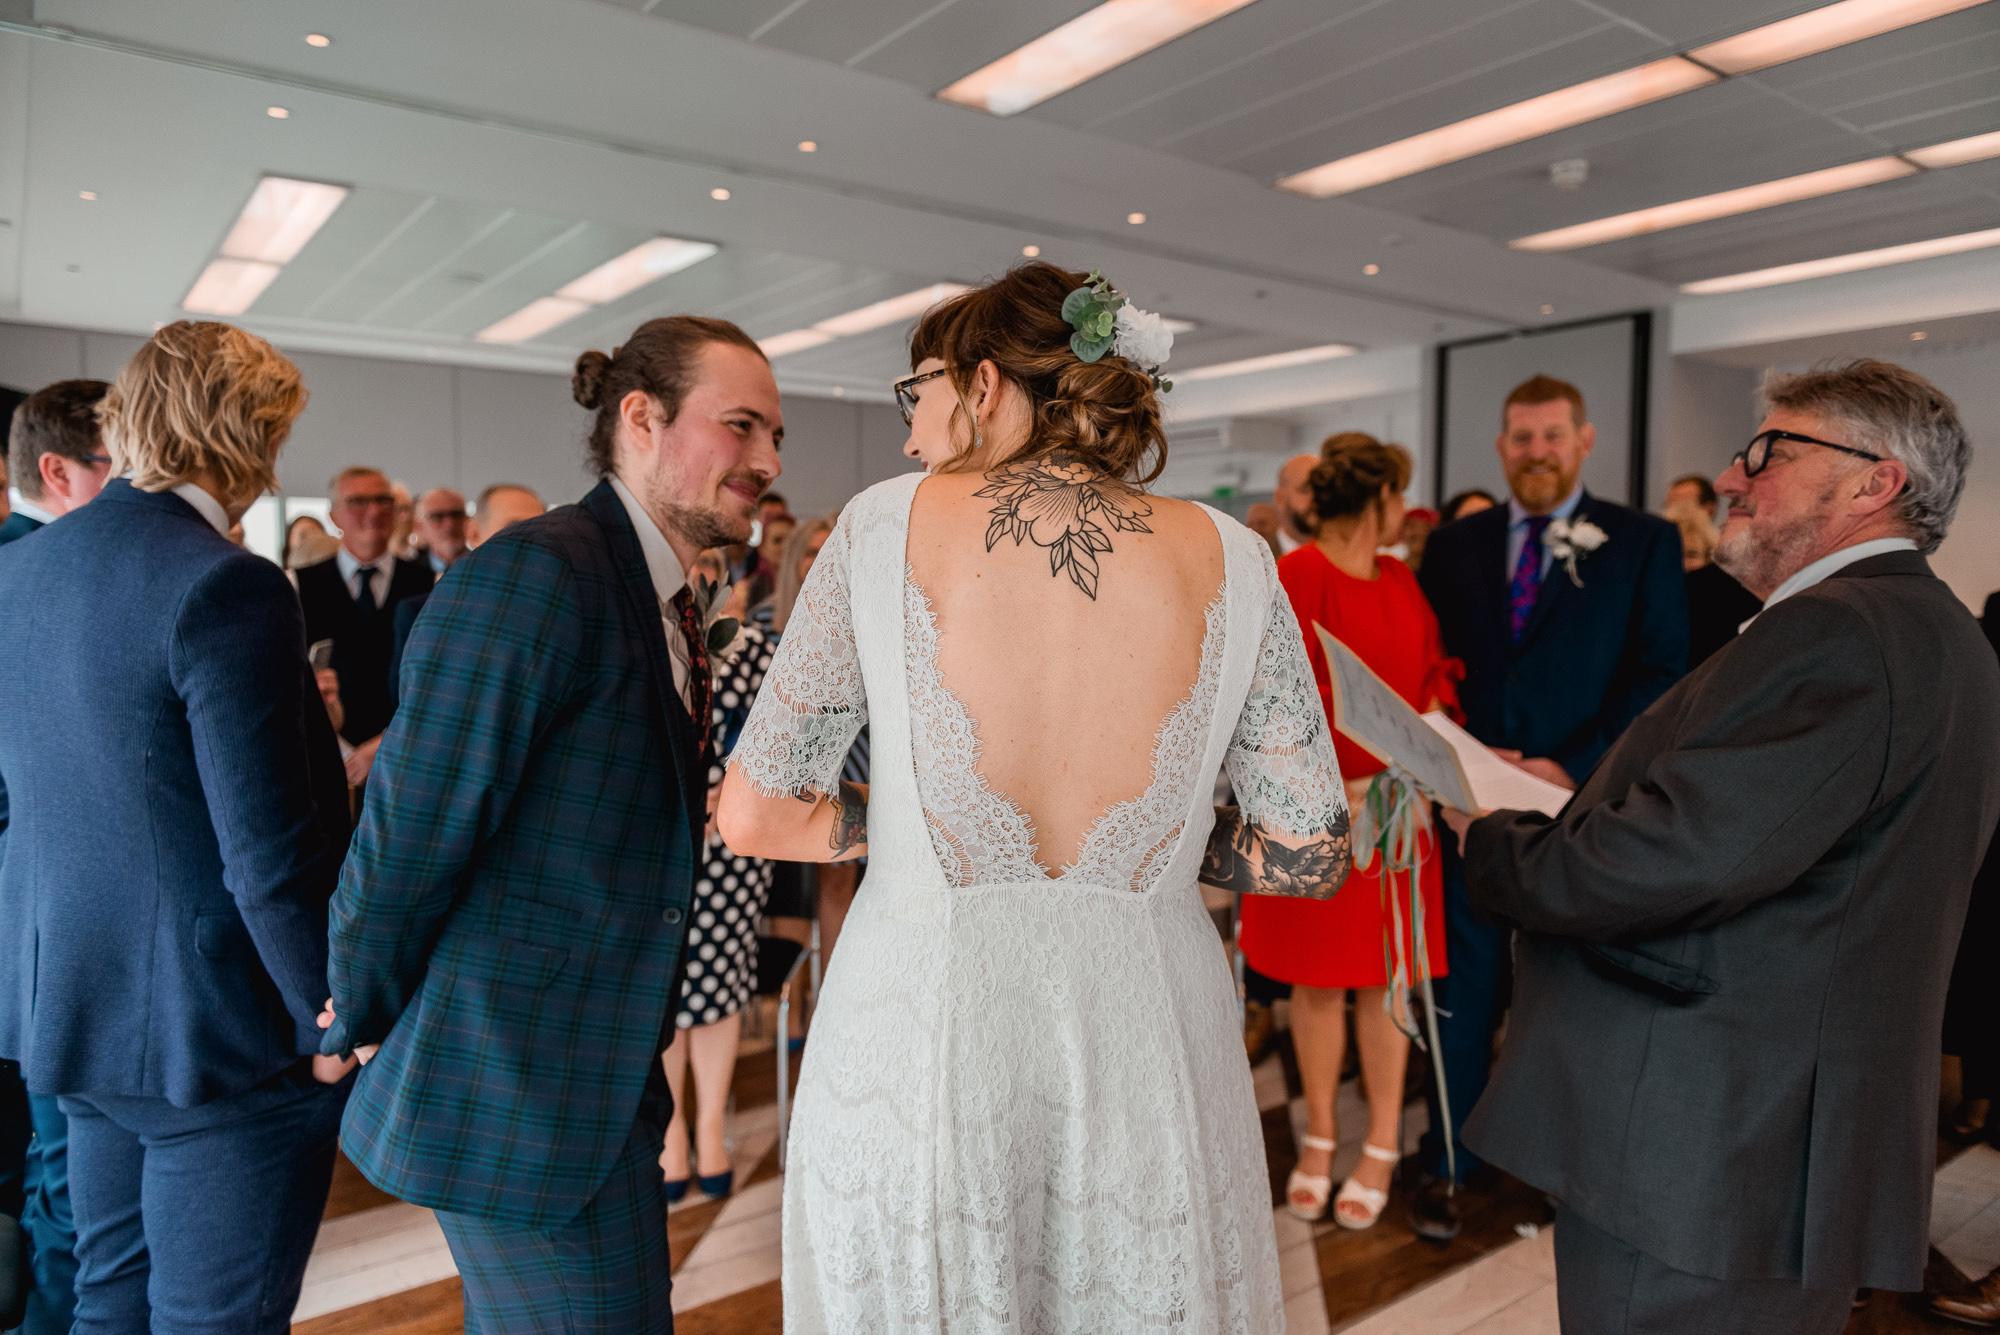 Harriet-Dahlia-Bespoke-Lace-Silk-Bohemian-Wedding-Dress-Sleeves-Tattooed-Bride-Alternative-Wedding-Sheffield-5.jpg